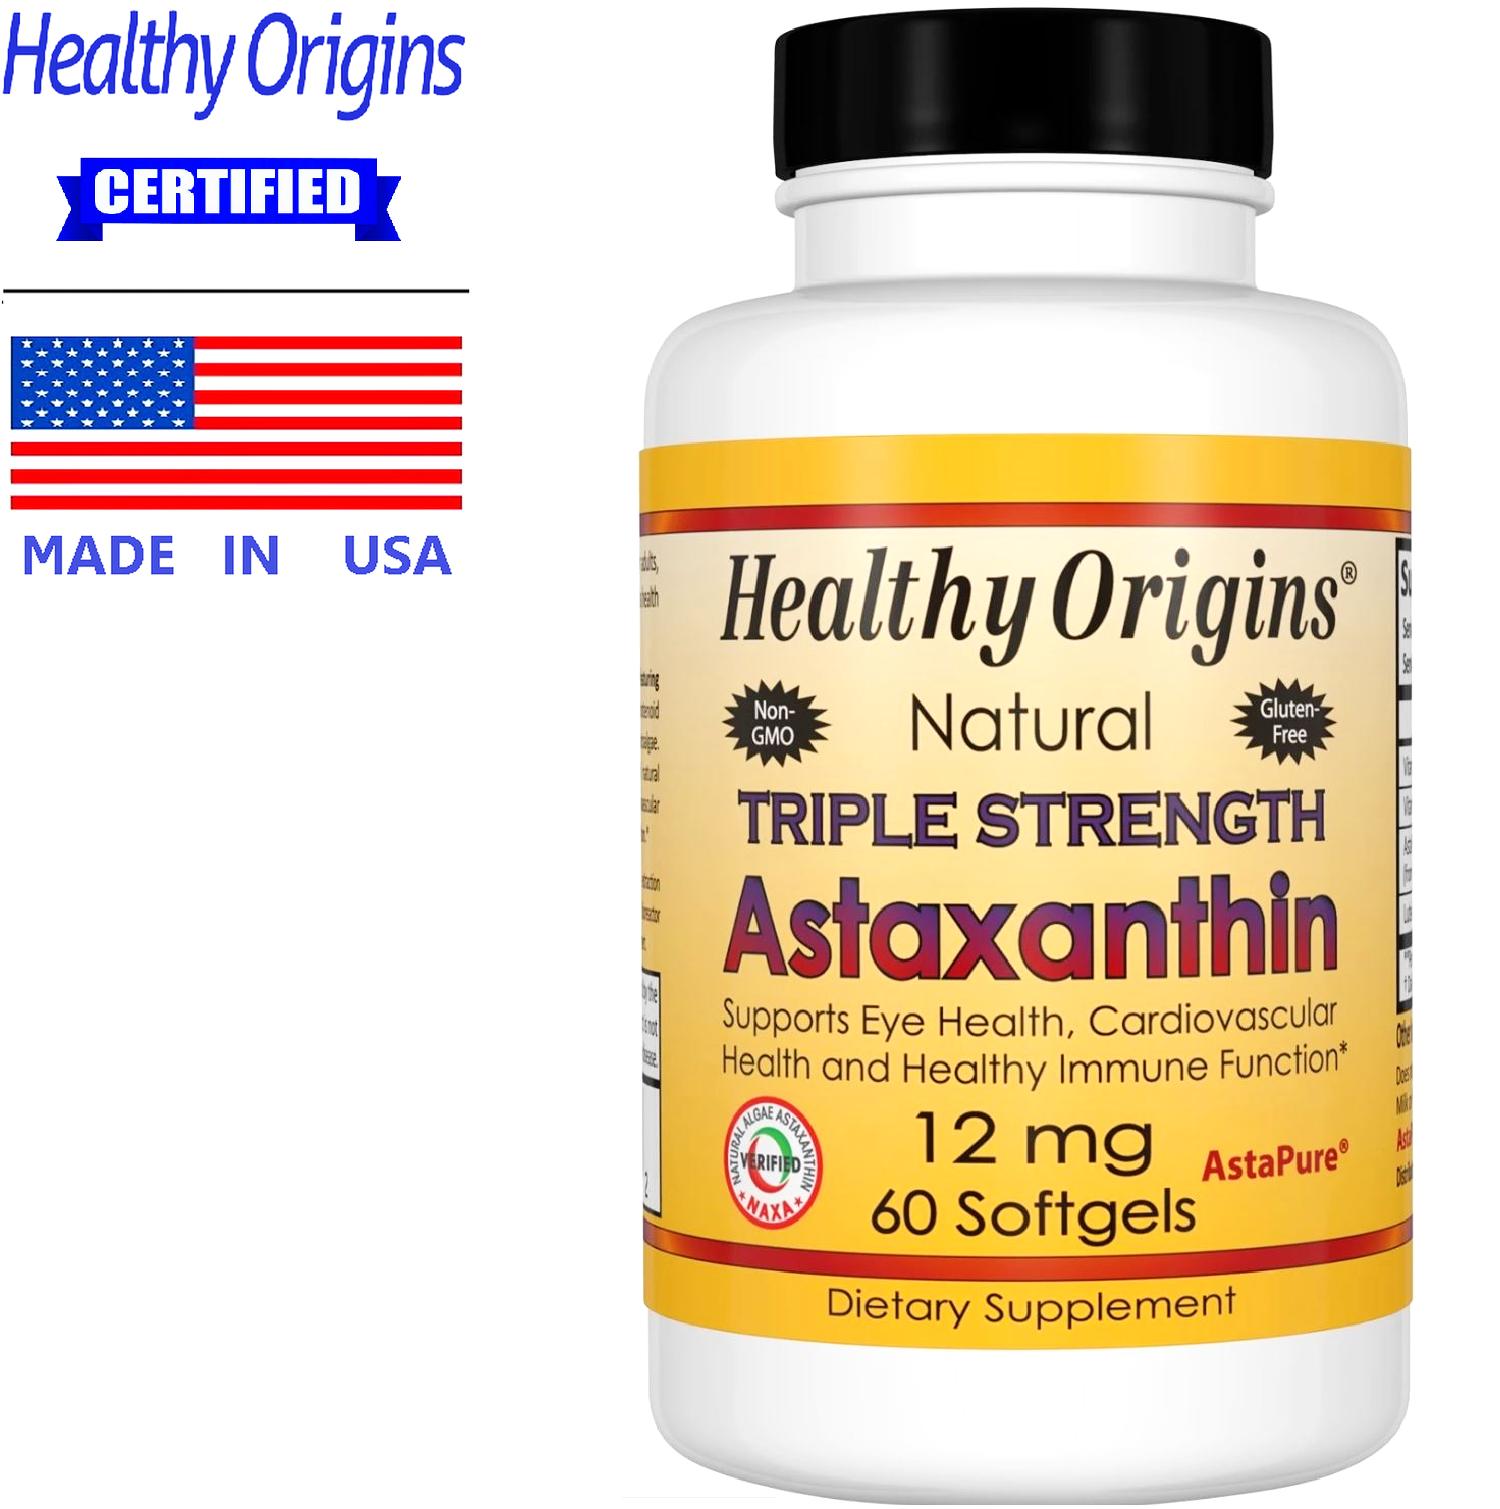 Healthy Origins Astaxanthin 12 mg x 60 เม็ด Aspire® เฮลท์ตี้ ออริจินส์ แอสตาแซนทิน สาหร่ายแดง สารต้านอนุมูลอิสระ แอสตร้าแซนธิน